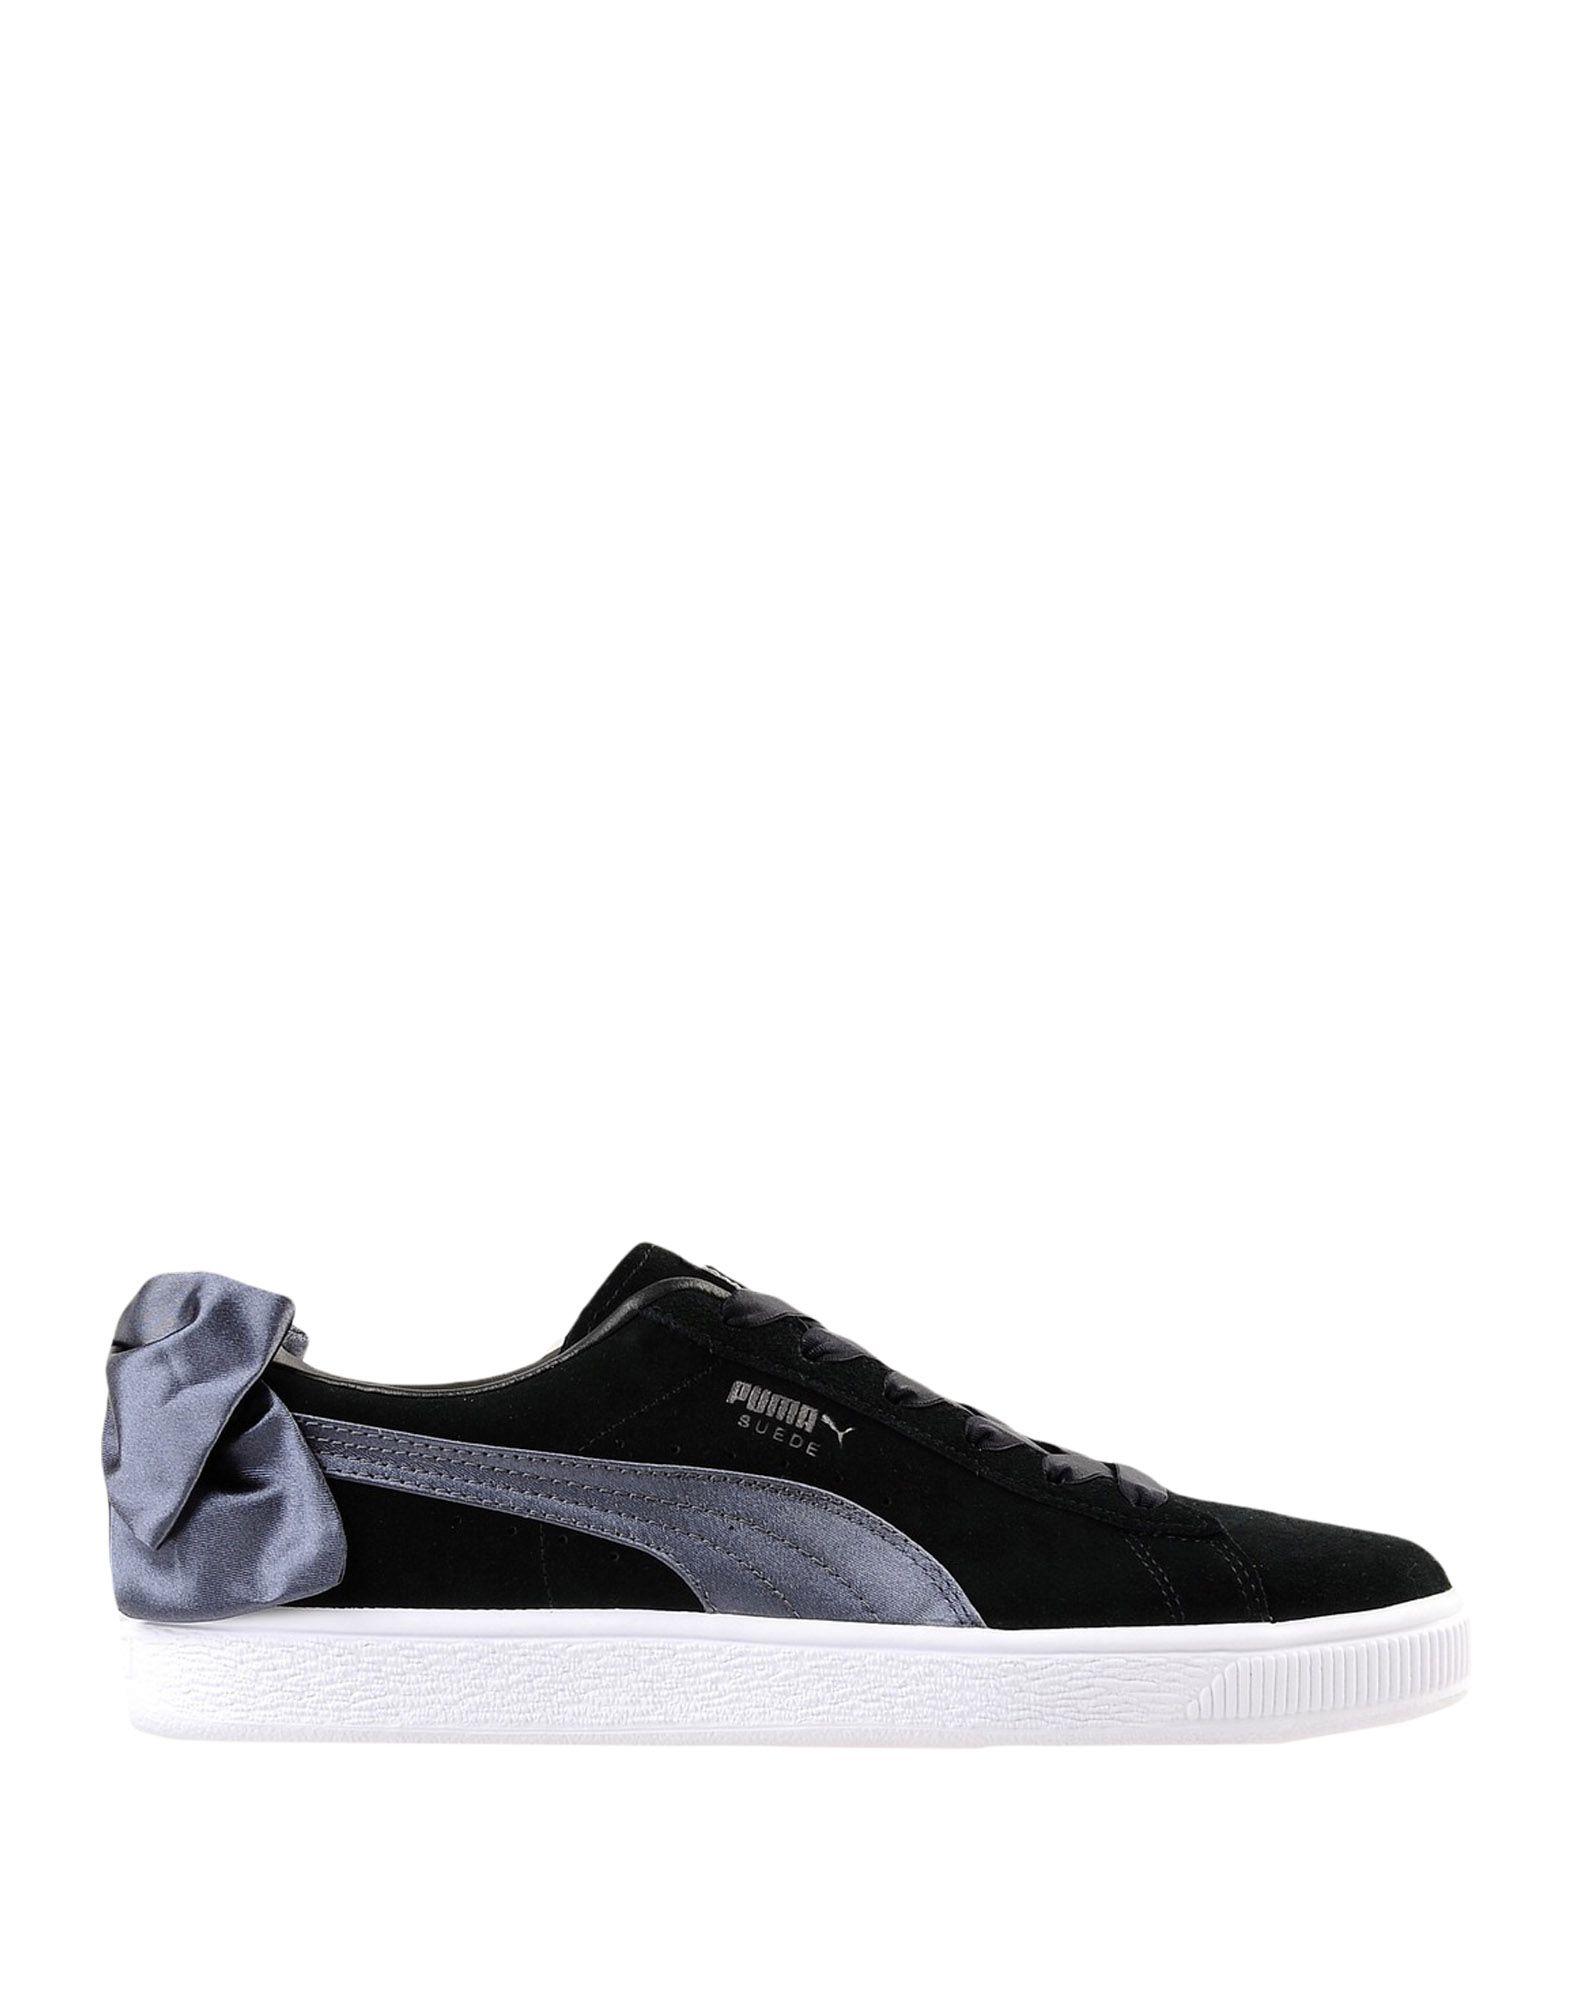 Puma Suede Bow Wn's Gate  11541435OB Gute Qualität beliebte Schuhe